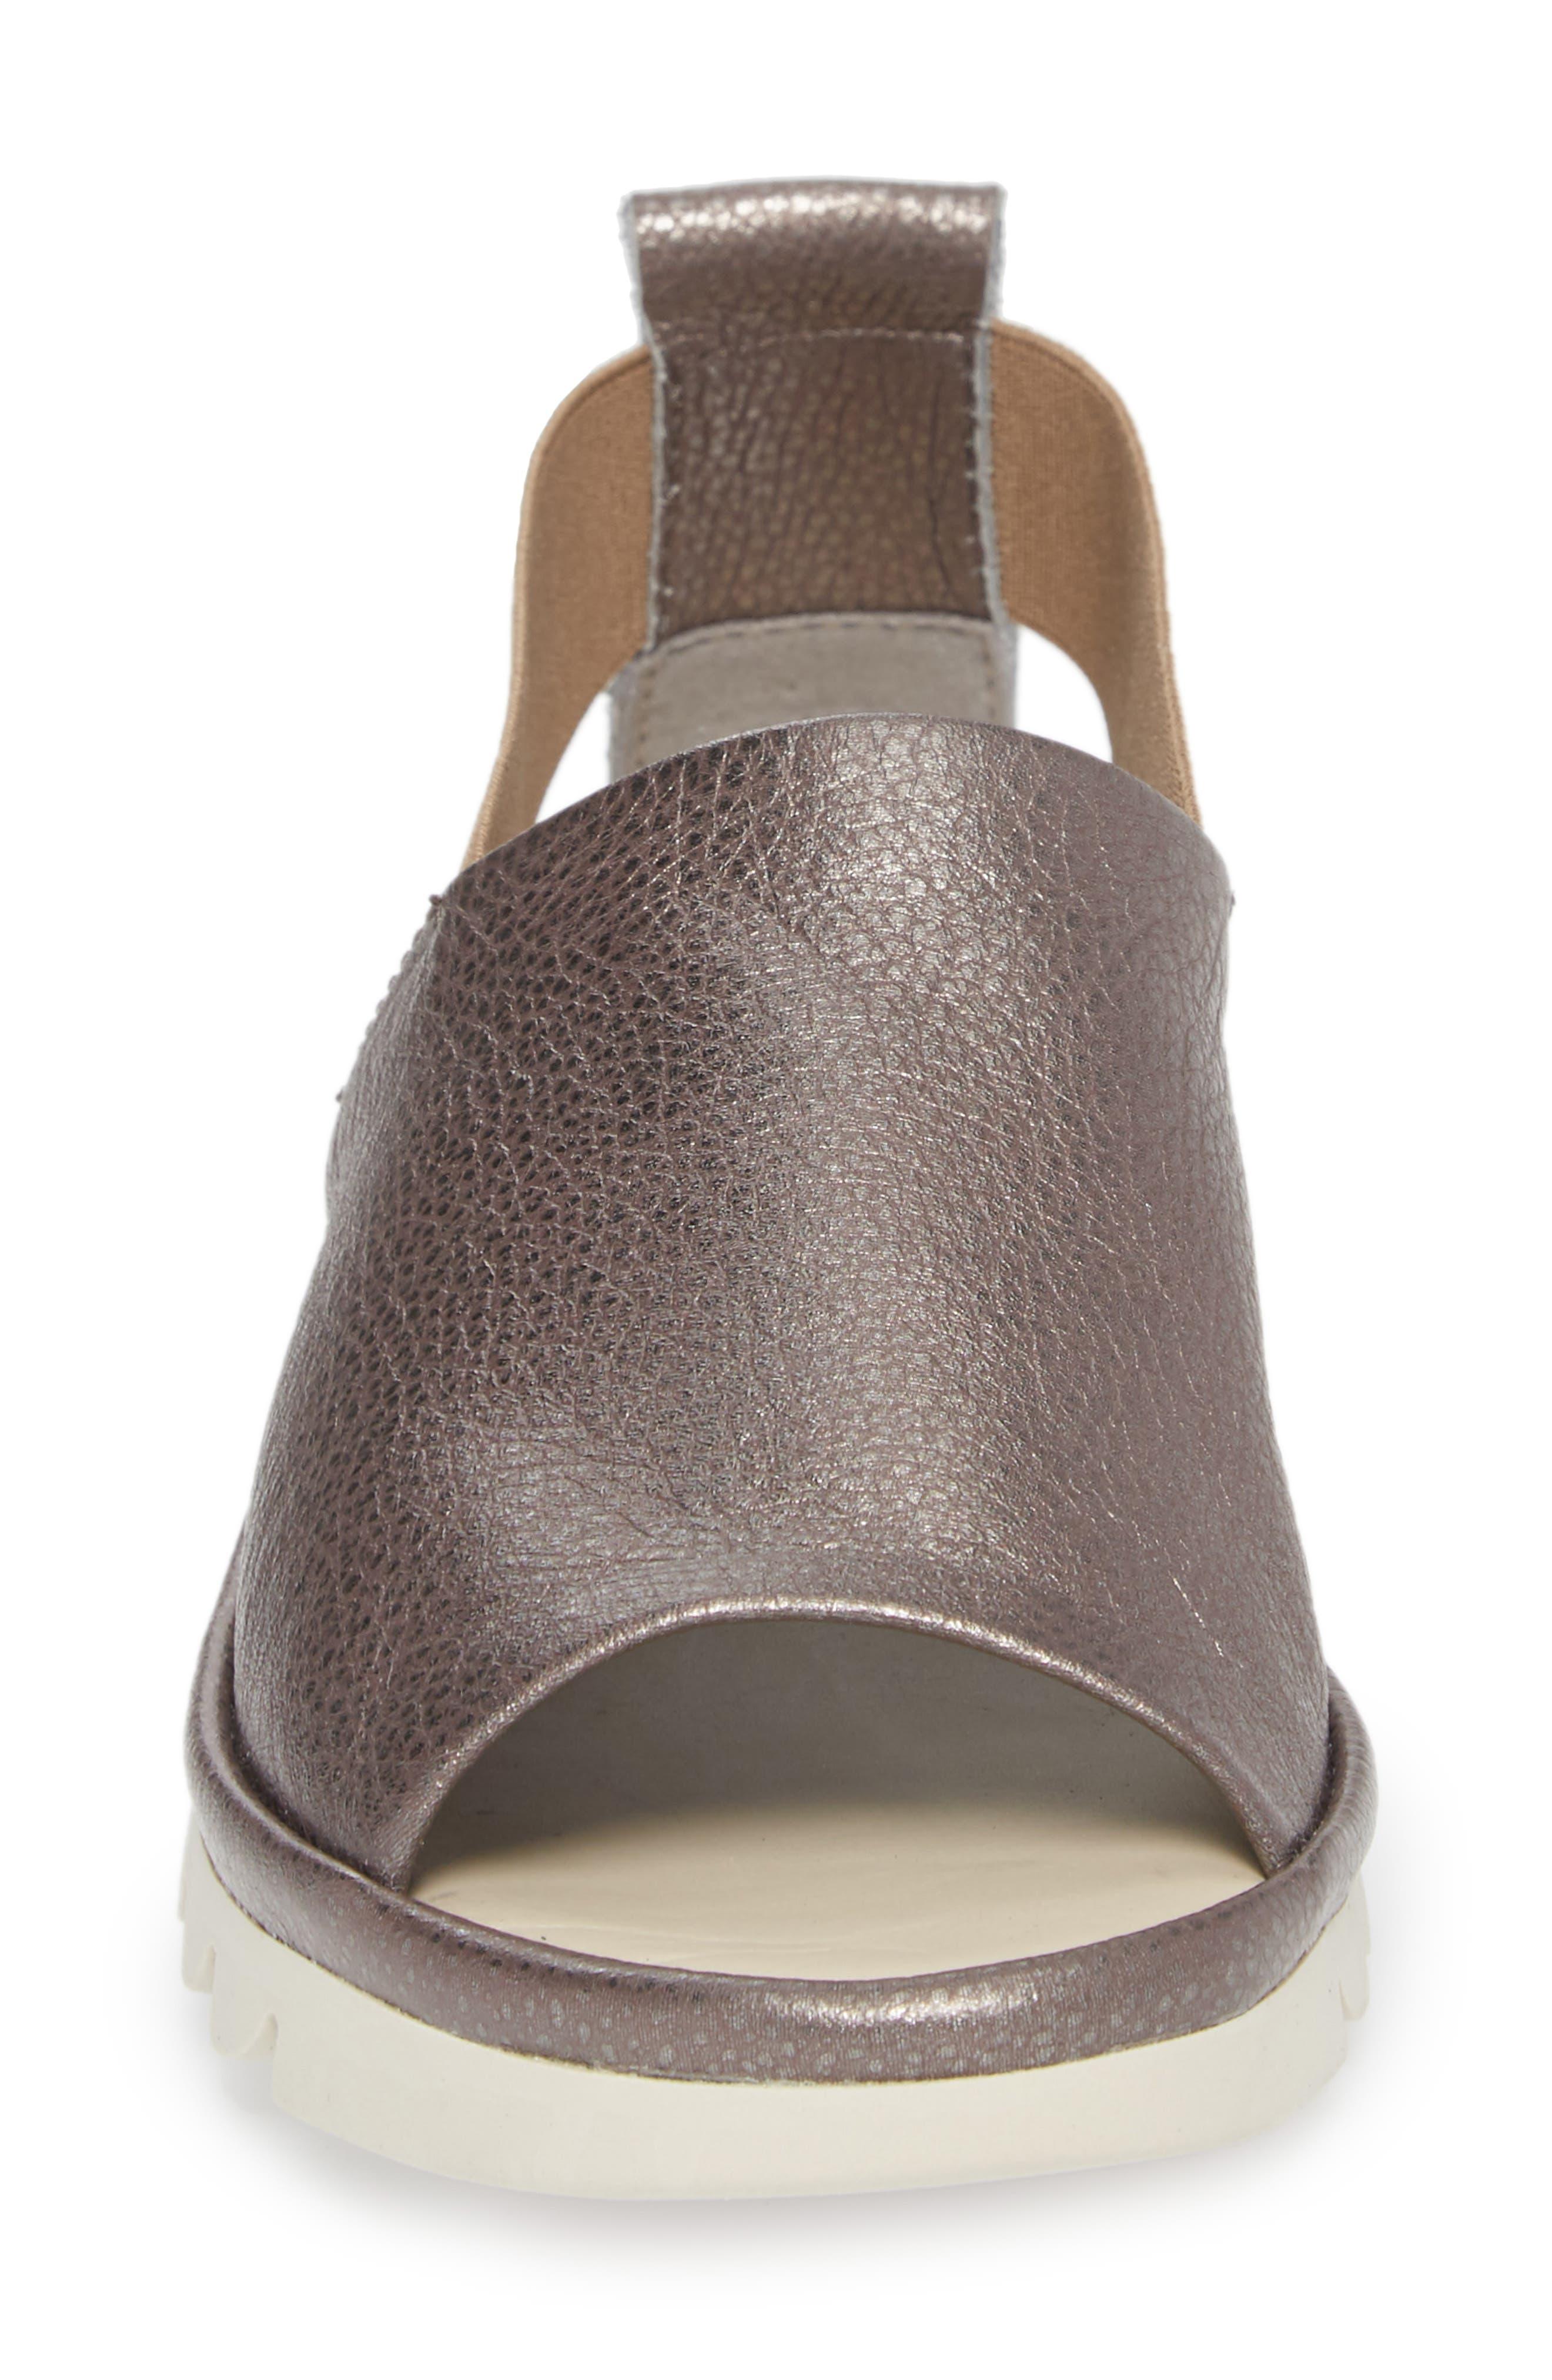 Shore Line Sandal,                             Alternate thumbnail 4, color,                             Canna Di Fucile Leather